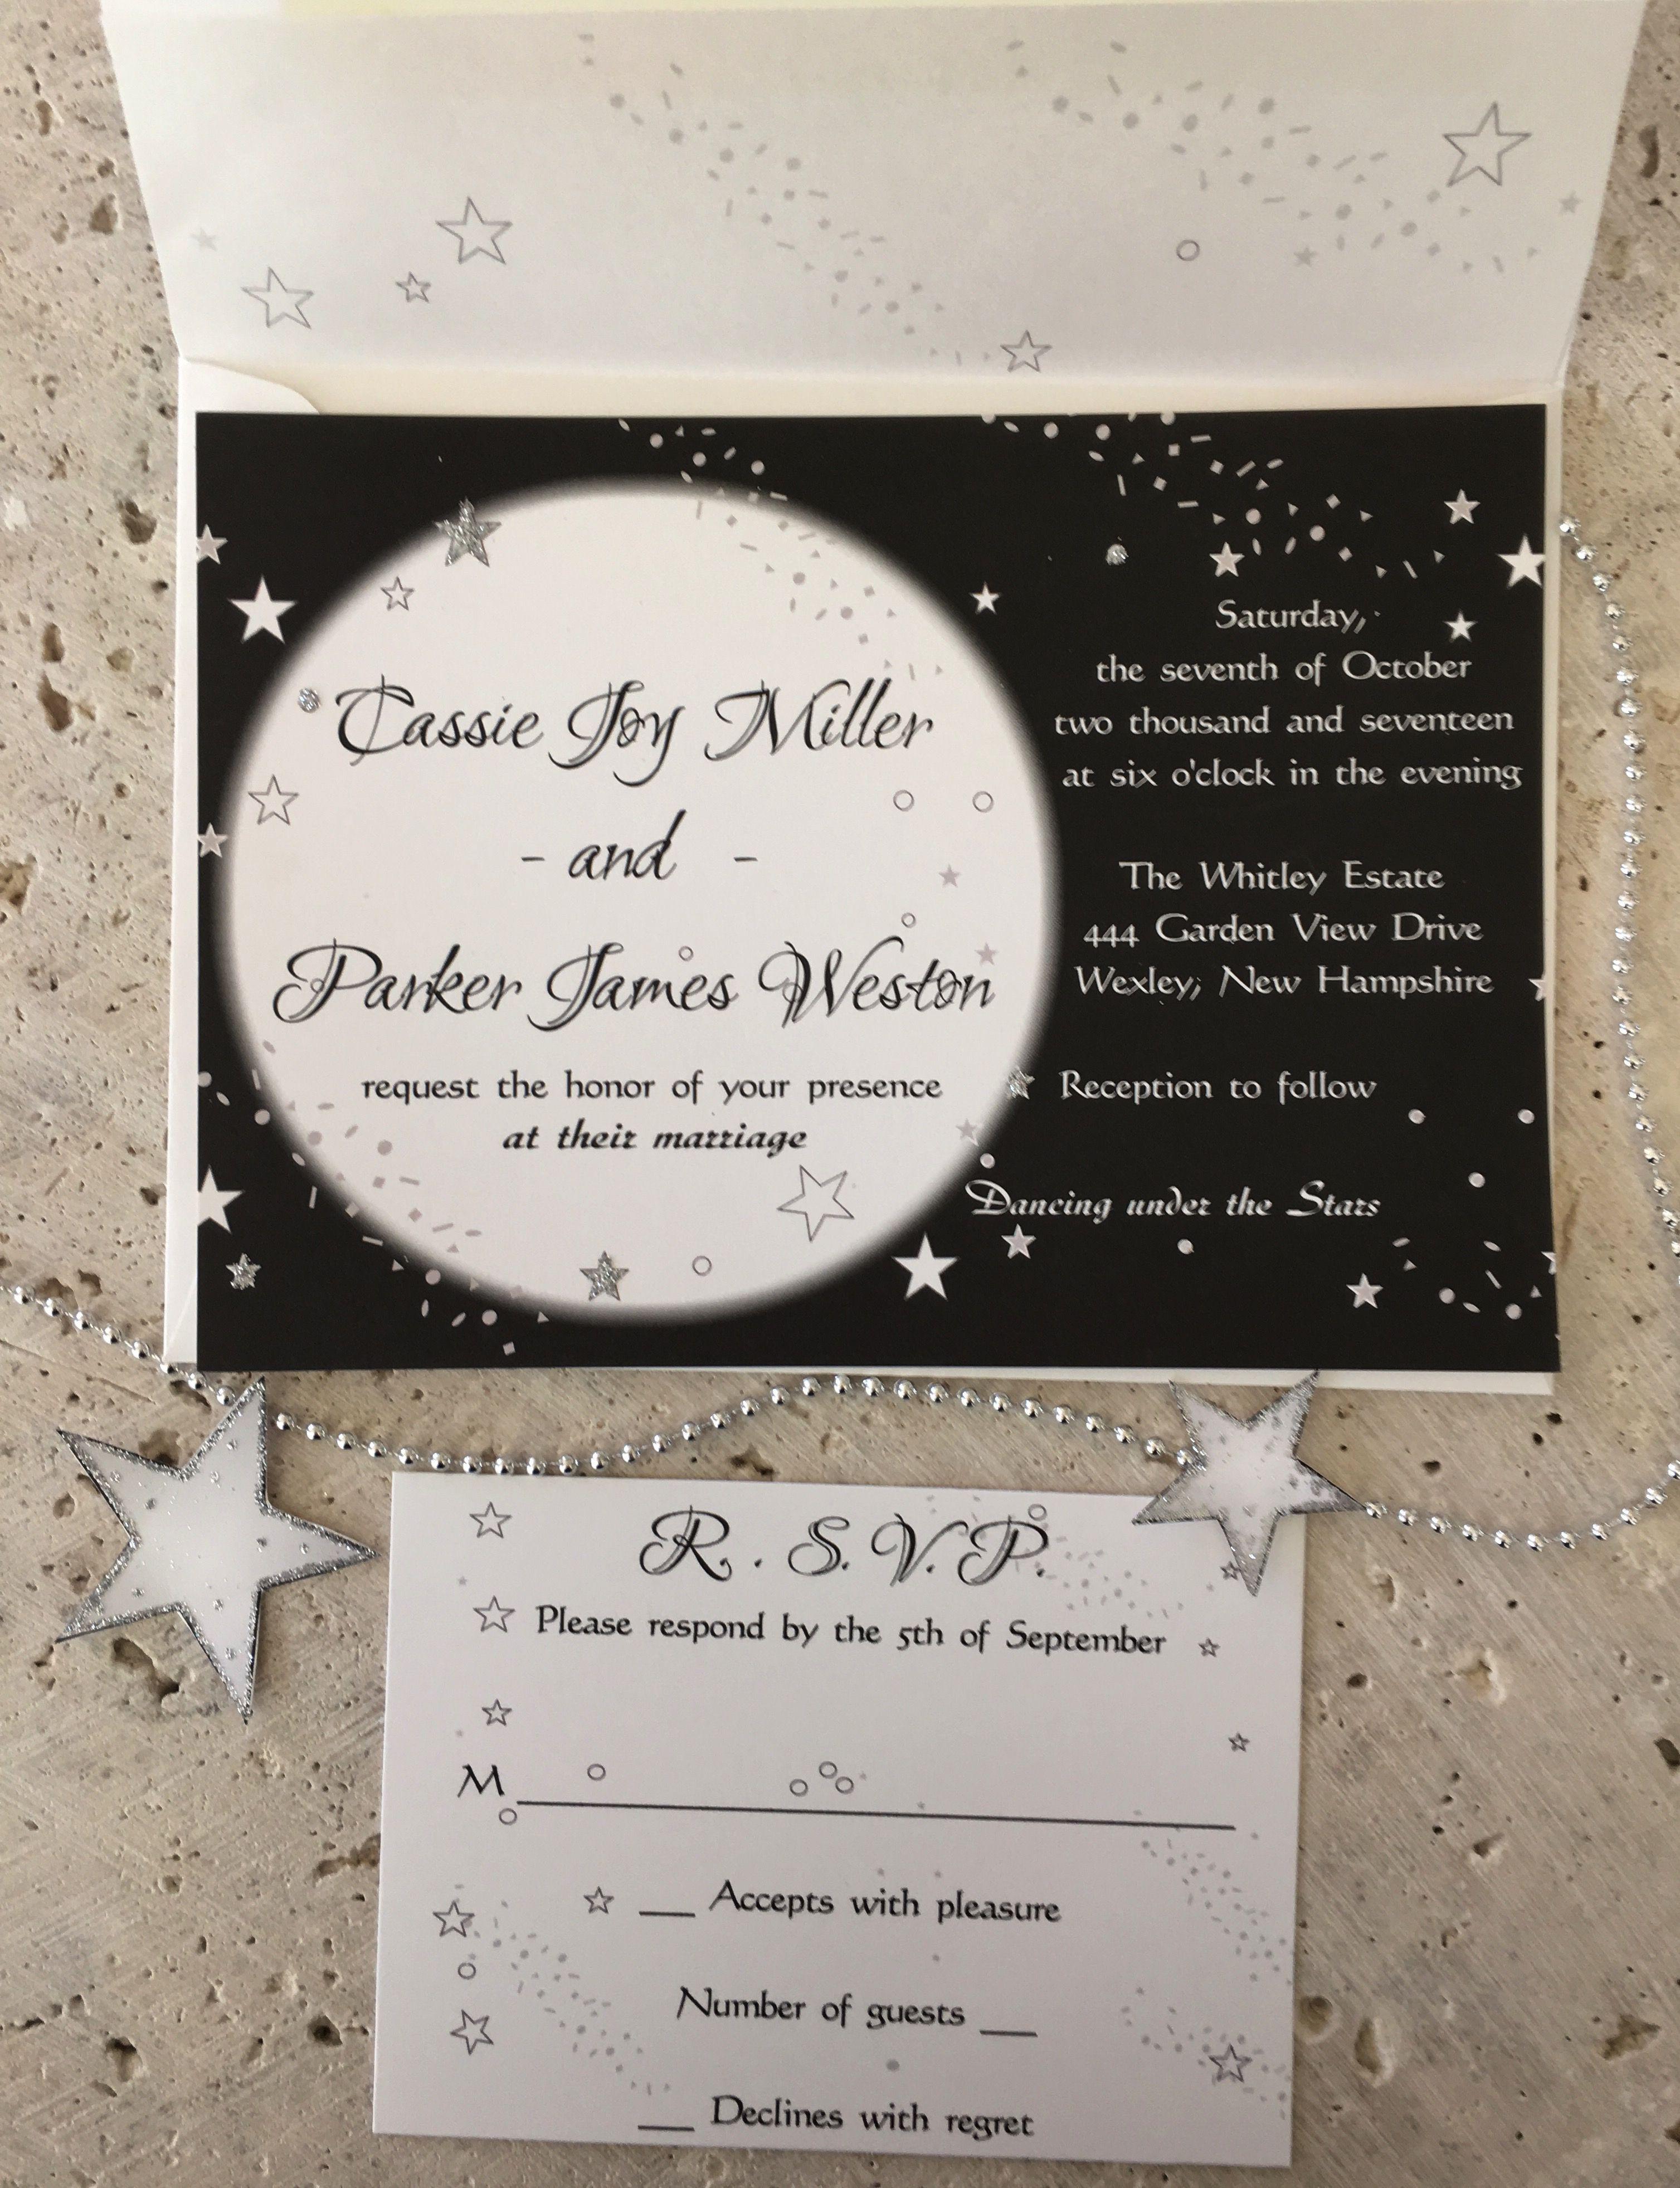 Moonlight & Stars Wedding Invitation | Star wedding, Weddings and ...